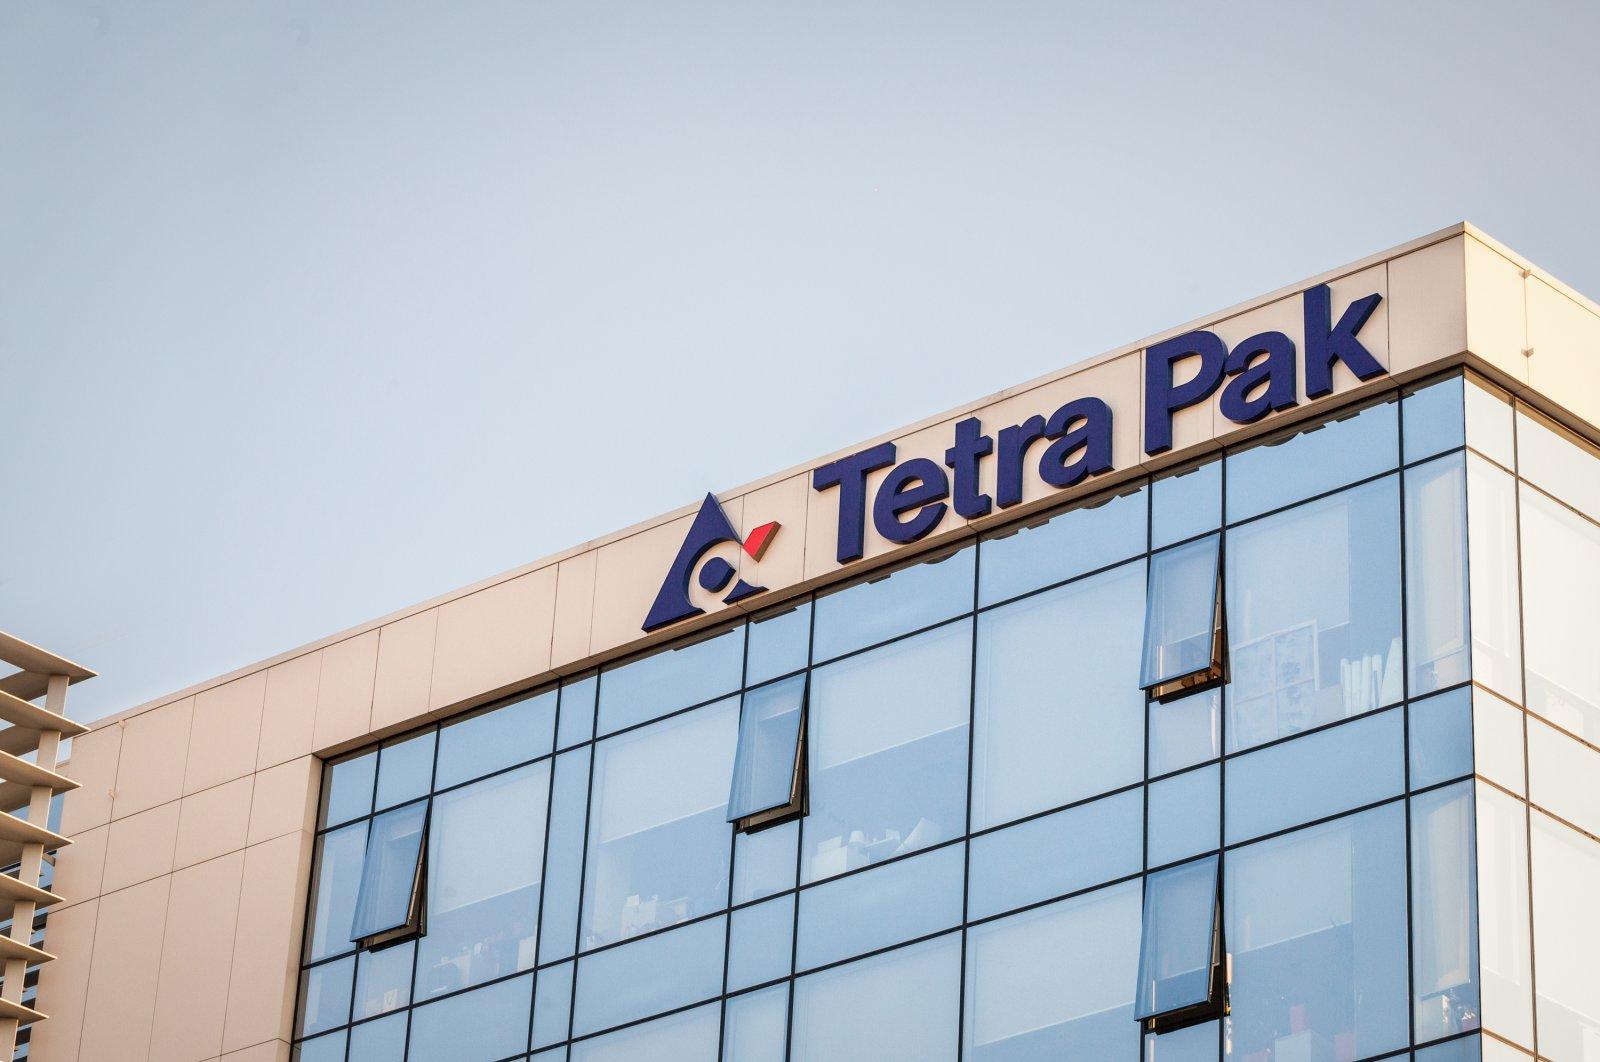 The Tetra Pak logo is seen on the company's headquarters in Belgrade, Serbia, Sept. 23, 2018. (iStock Photo)